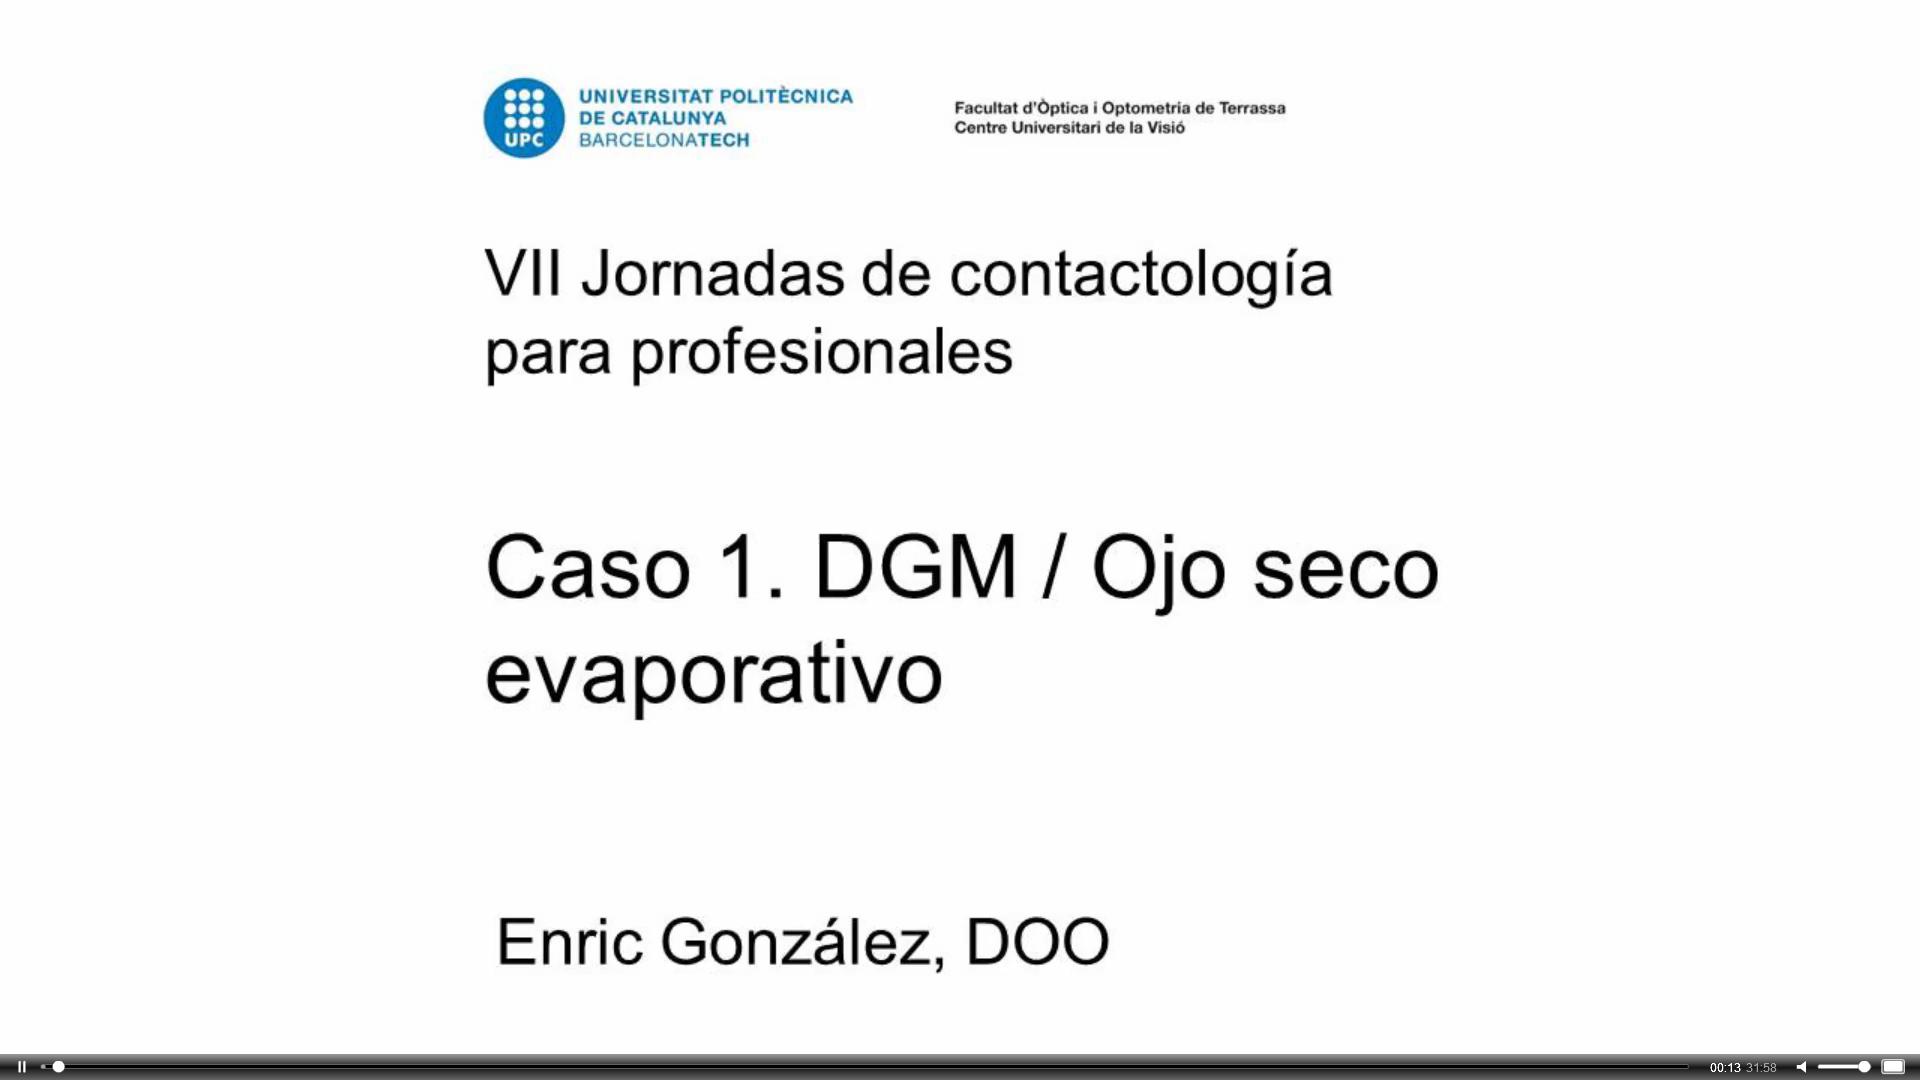 JLC2017_caso_1(Enric_Gonzalez)